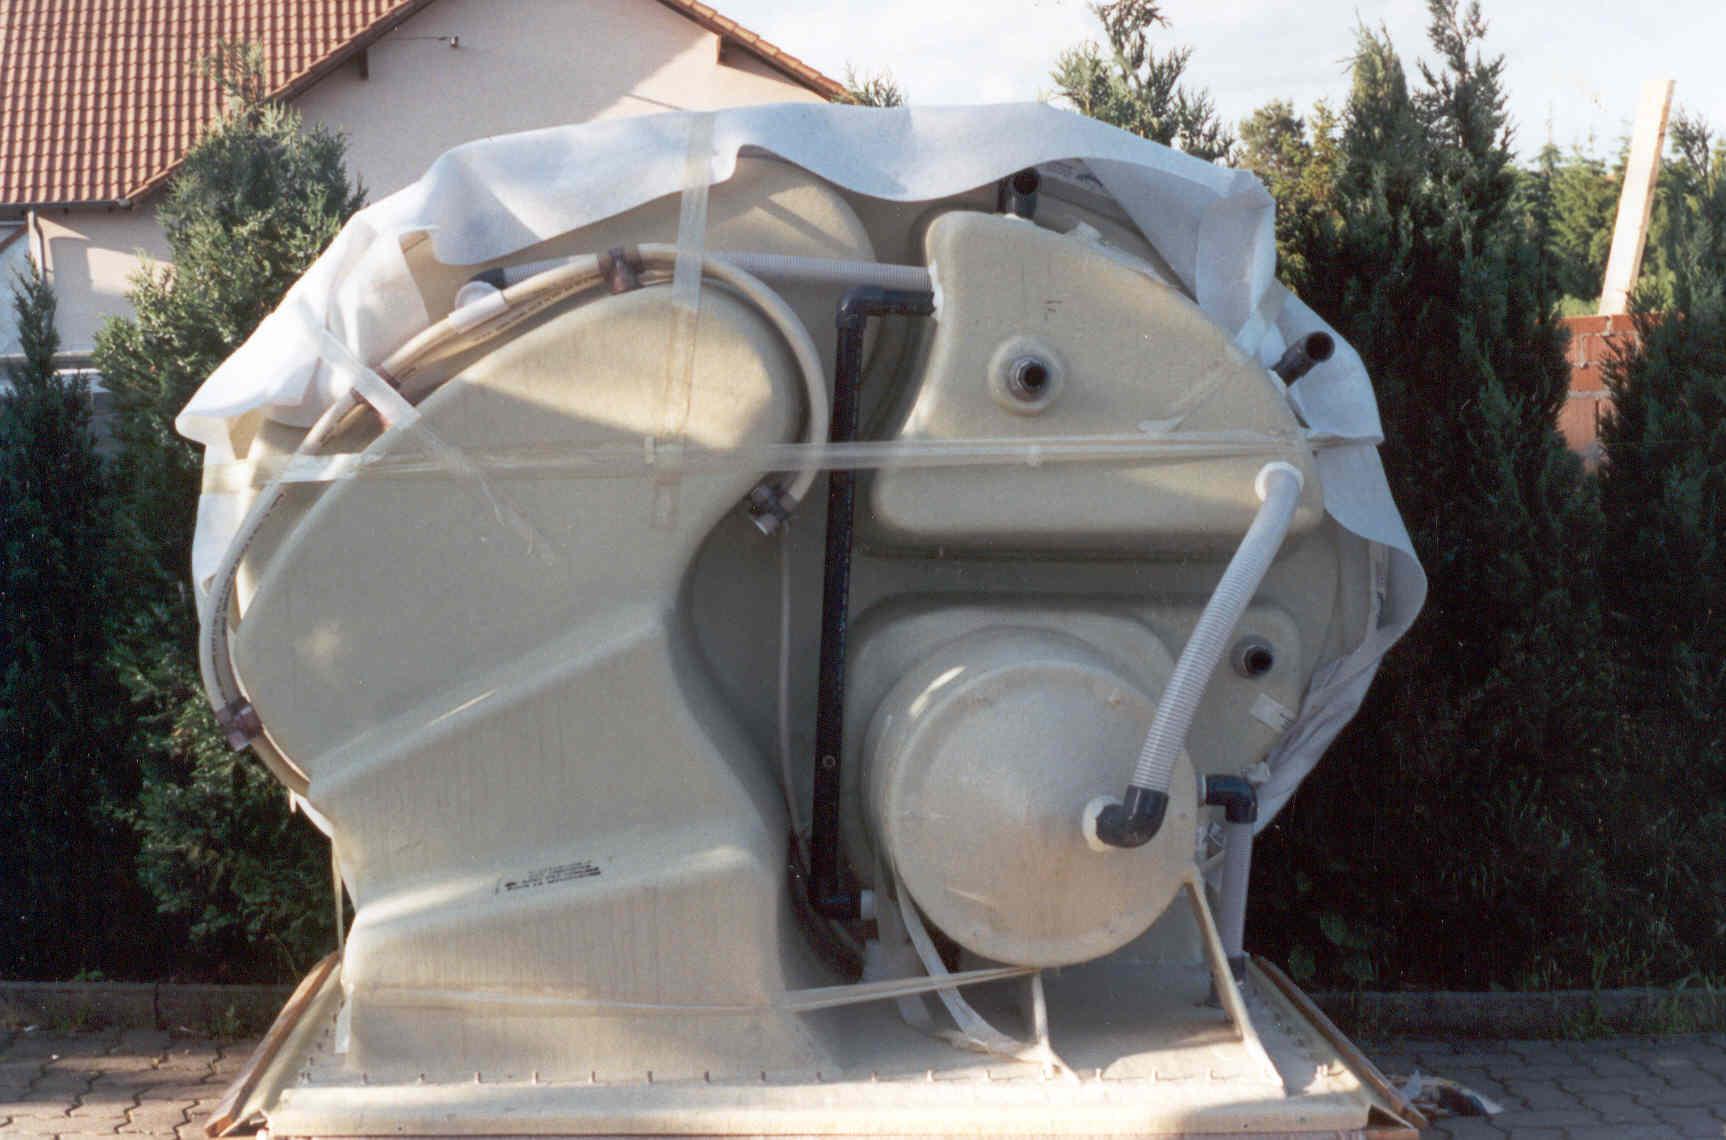 Fuite escawat turbojet - balnéo (RÉSOLU) 18_escawat02